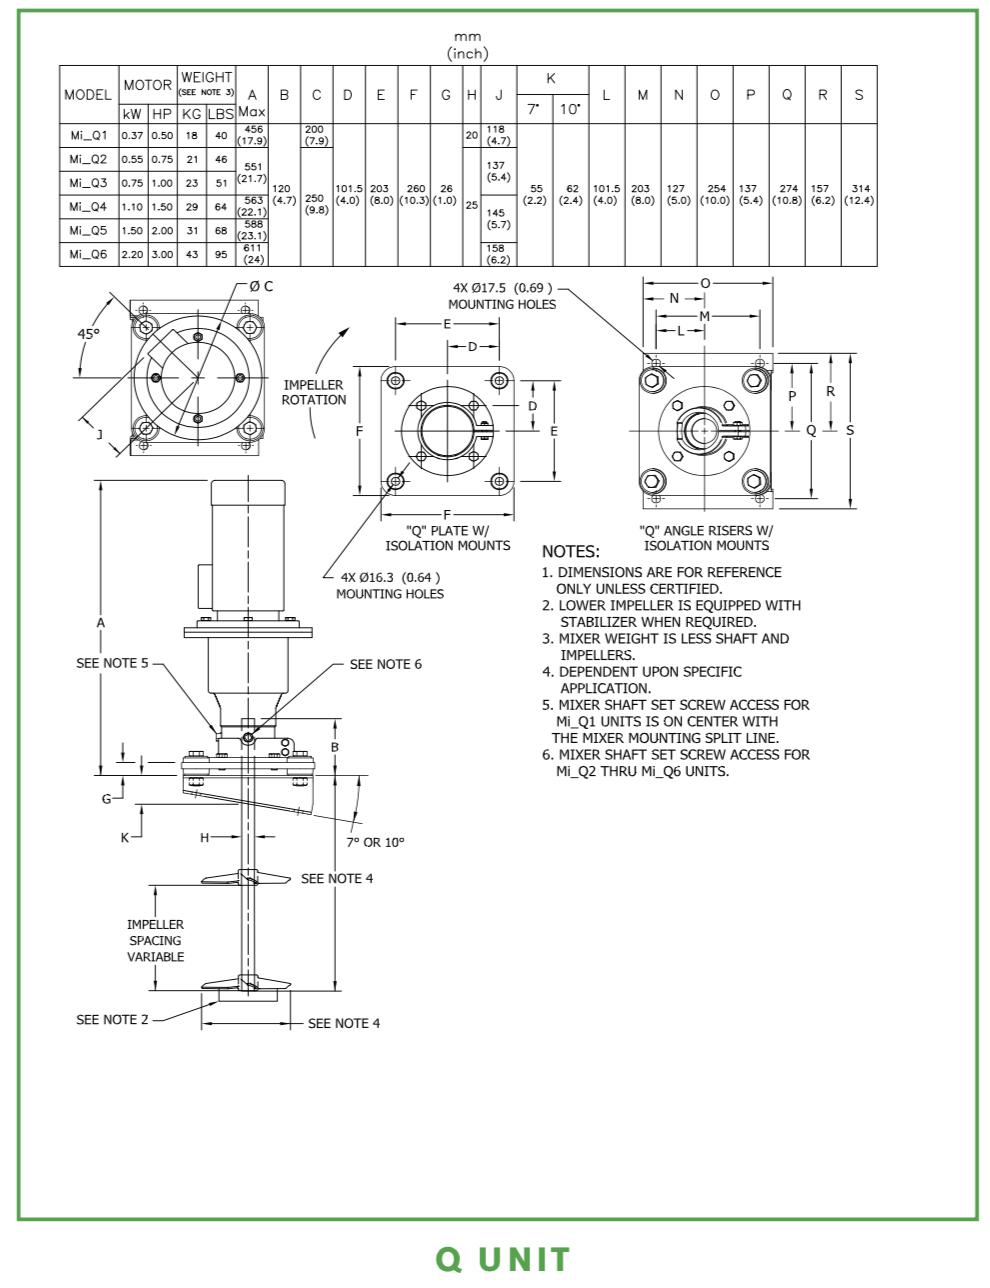 Lightnin Nettco i-Series Mixer – PT Thema Artha Perkasa